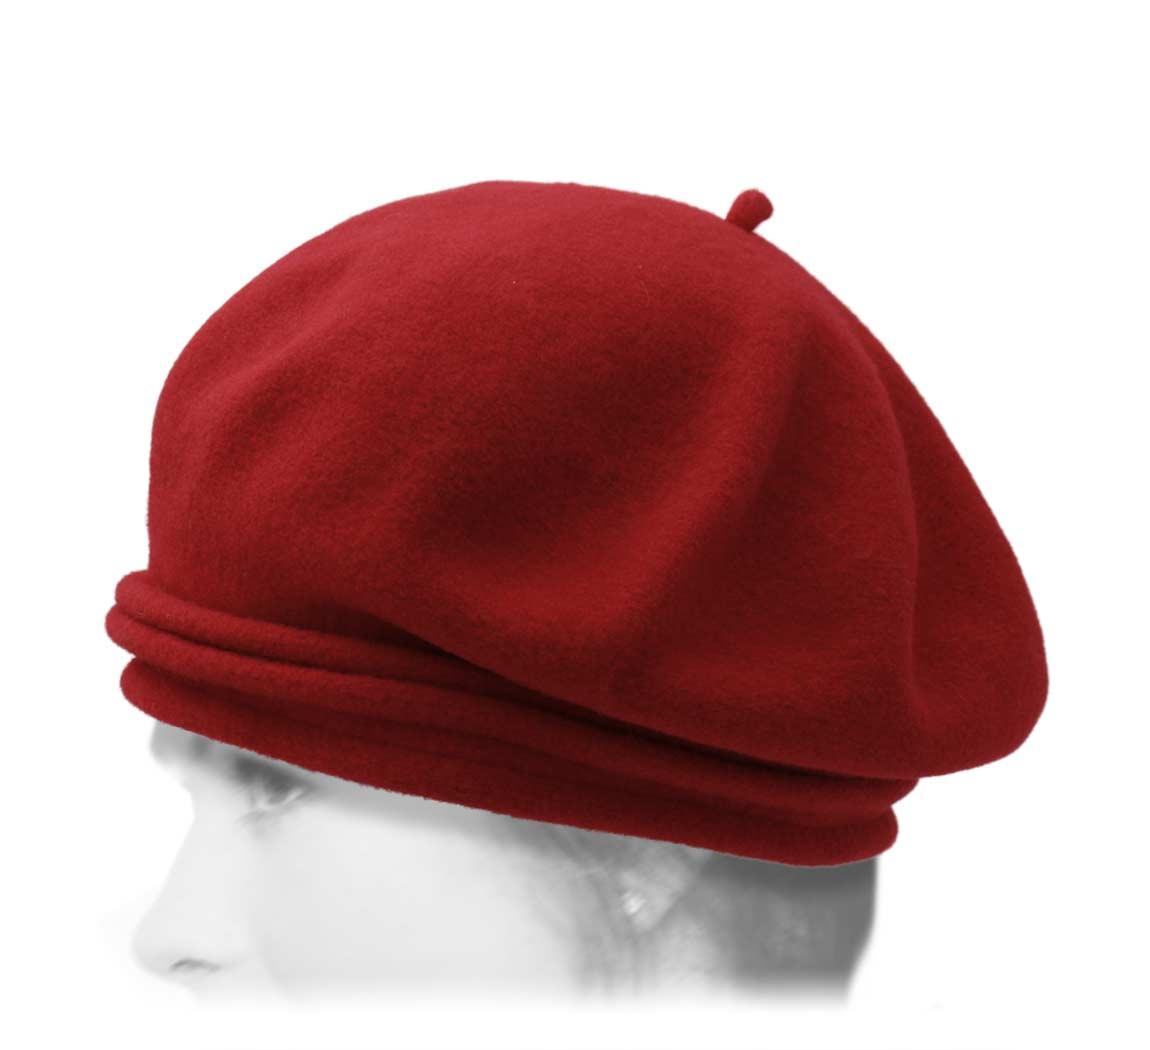 Chopin - Caps Laulhère 666885e5e040